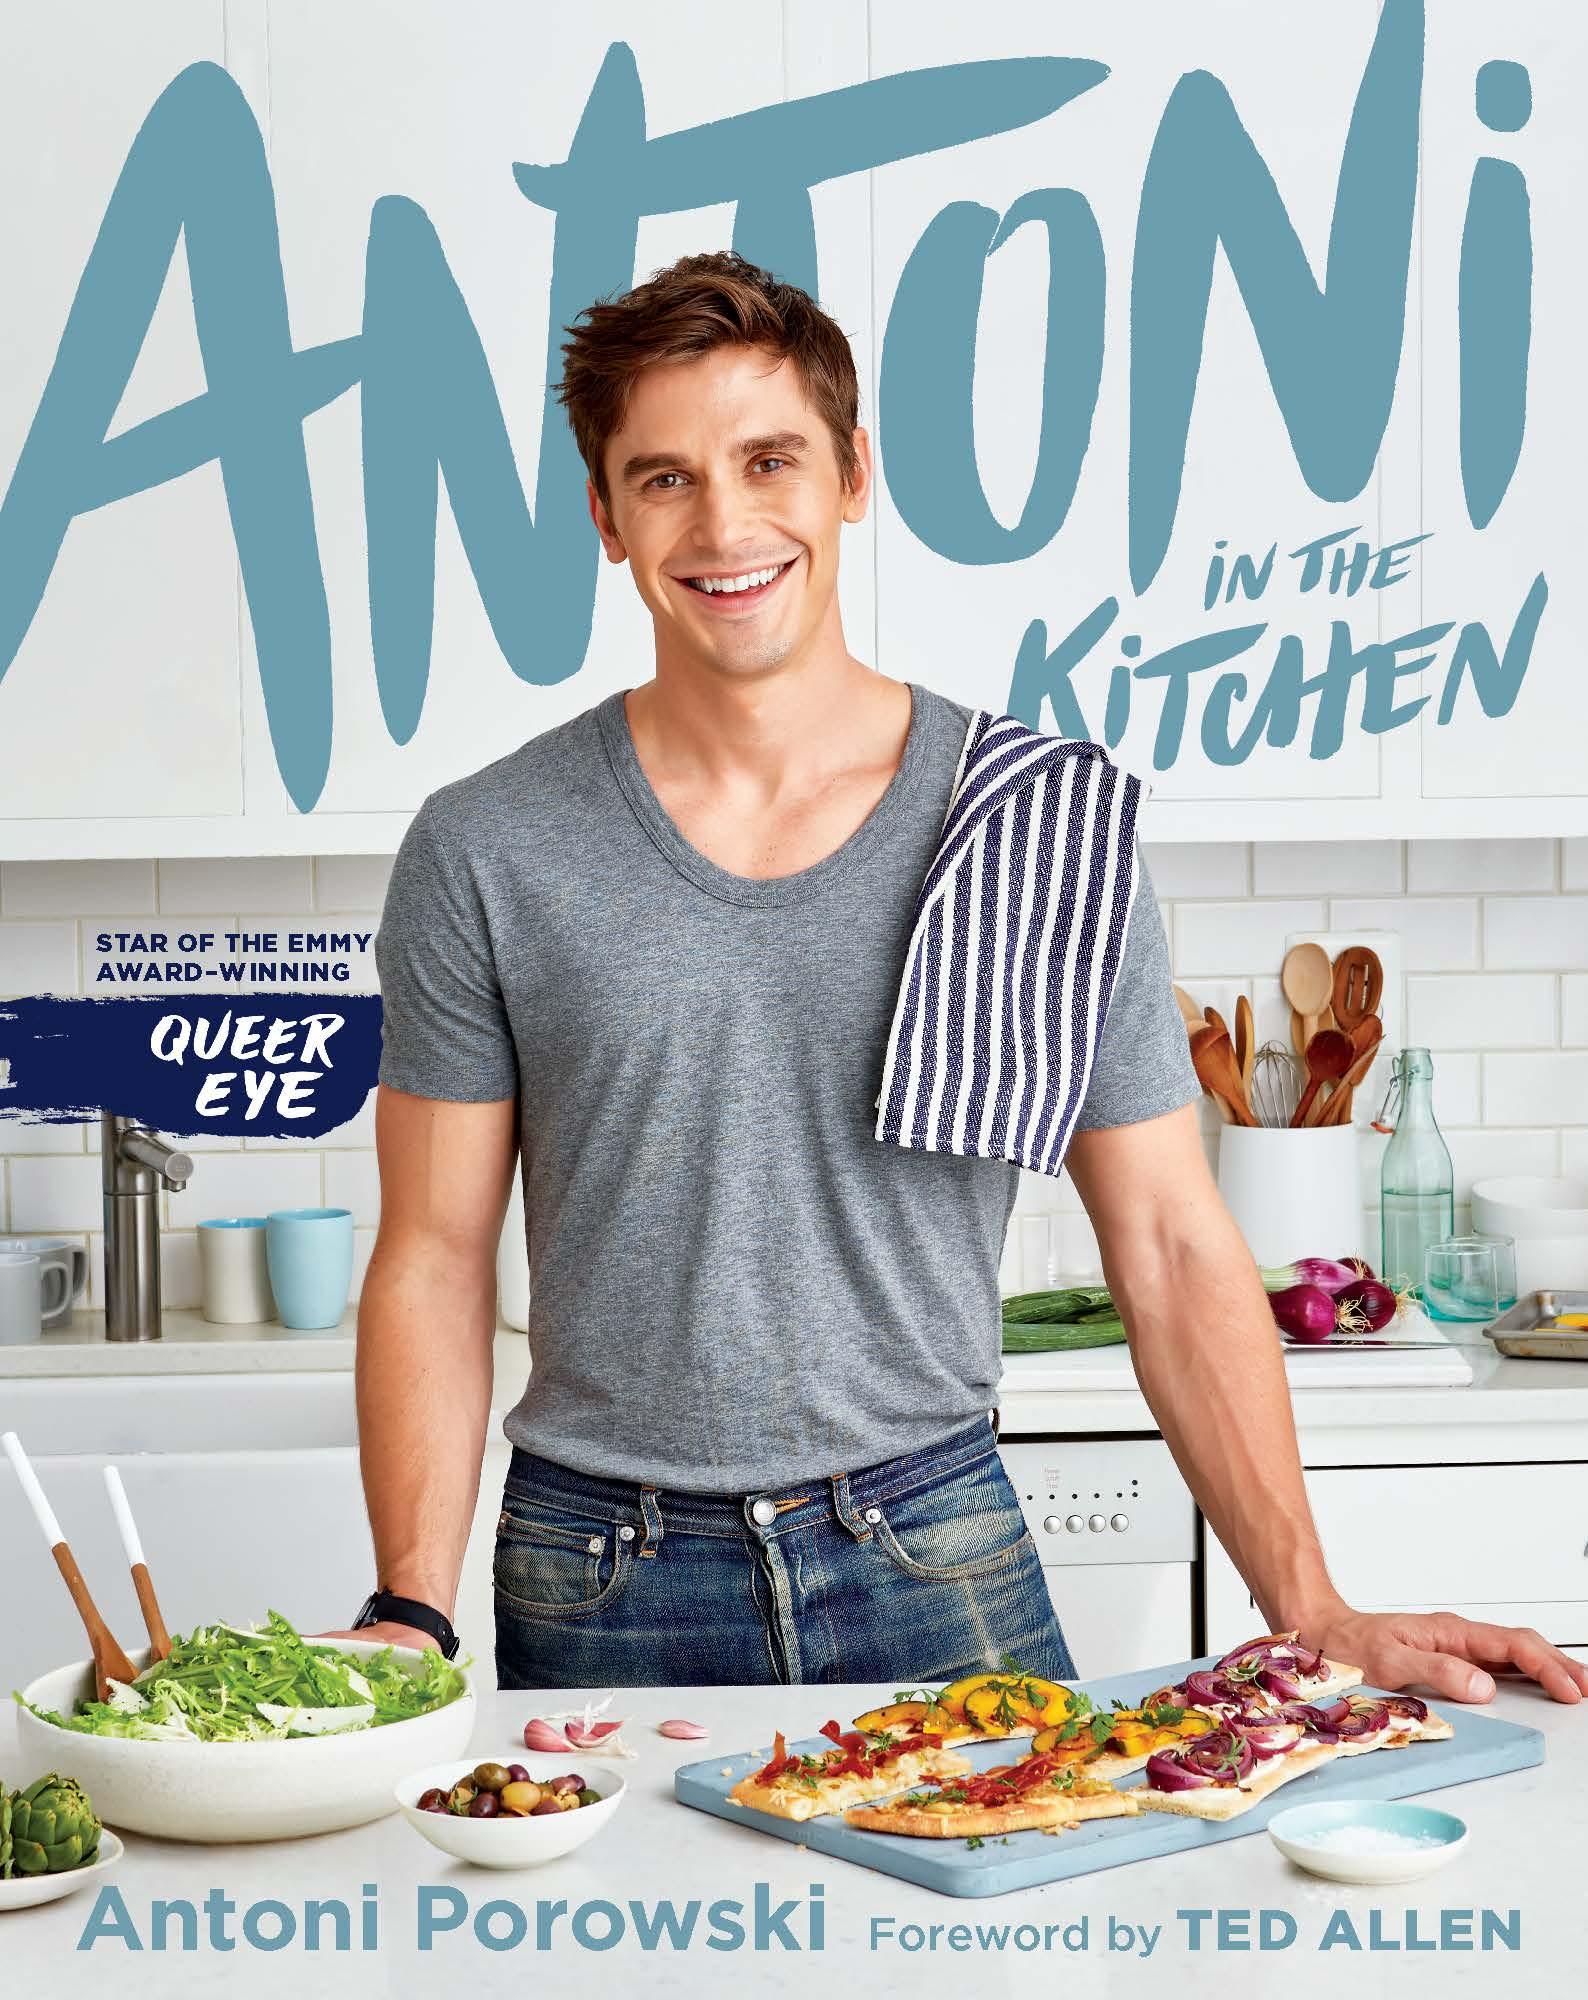 Porowski_Antoni-in-the-Kitchen_E-blad_final 1.jpg